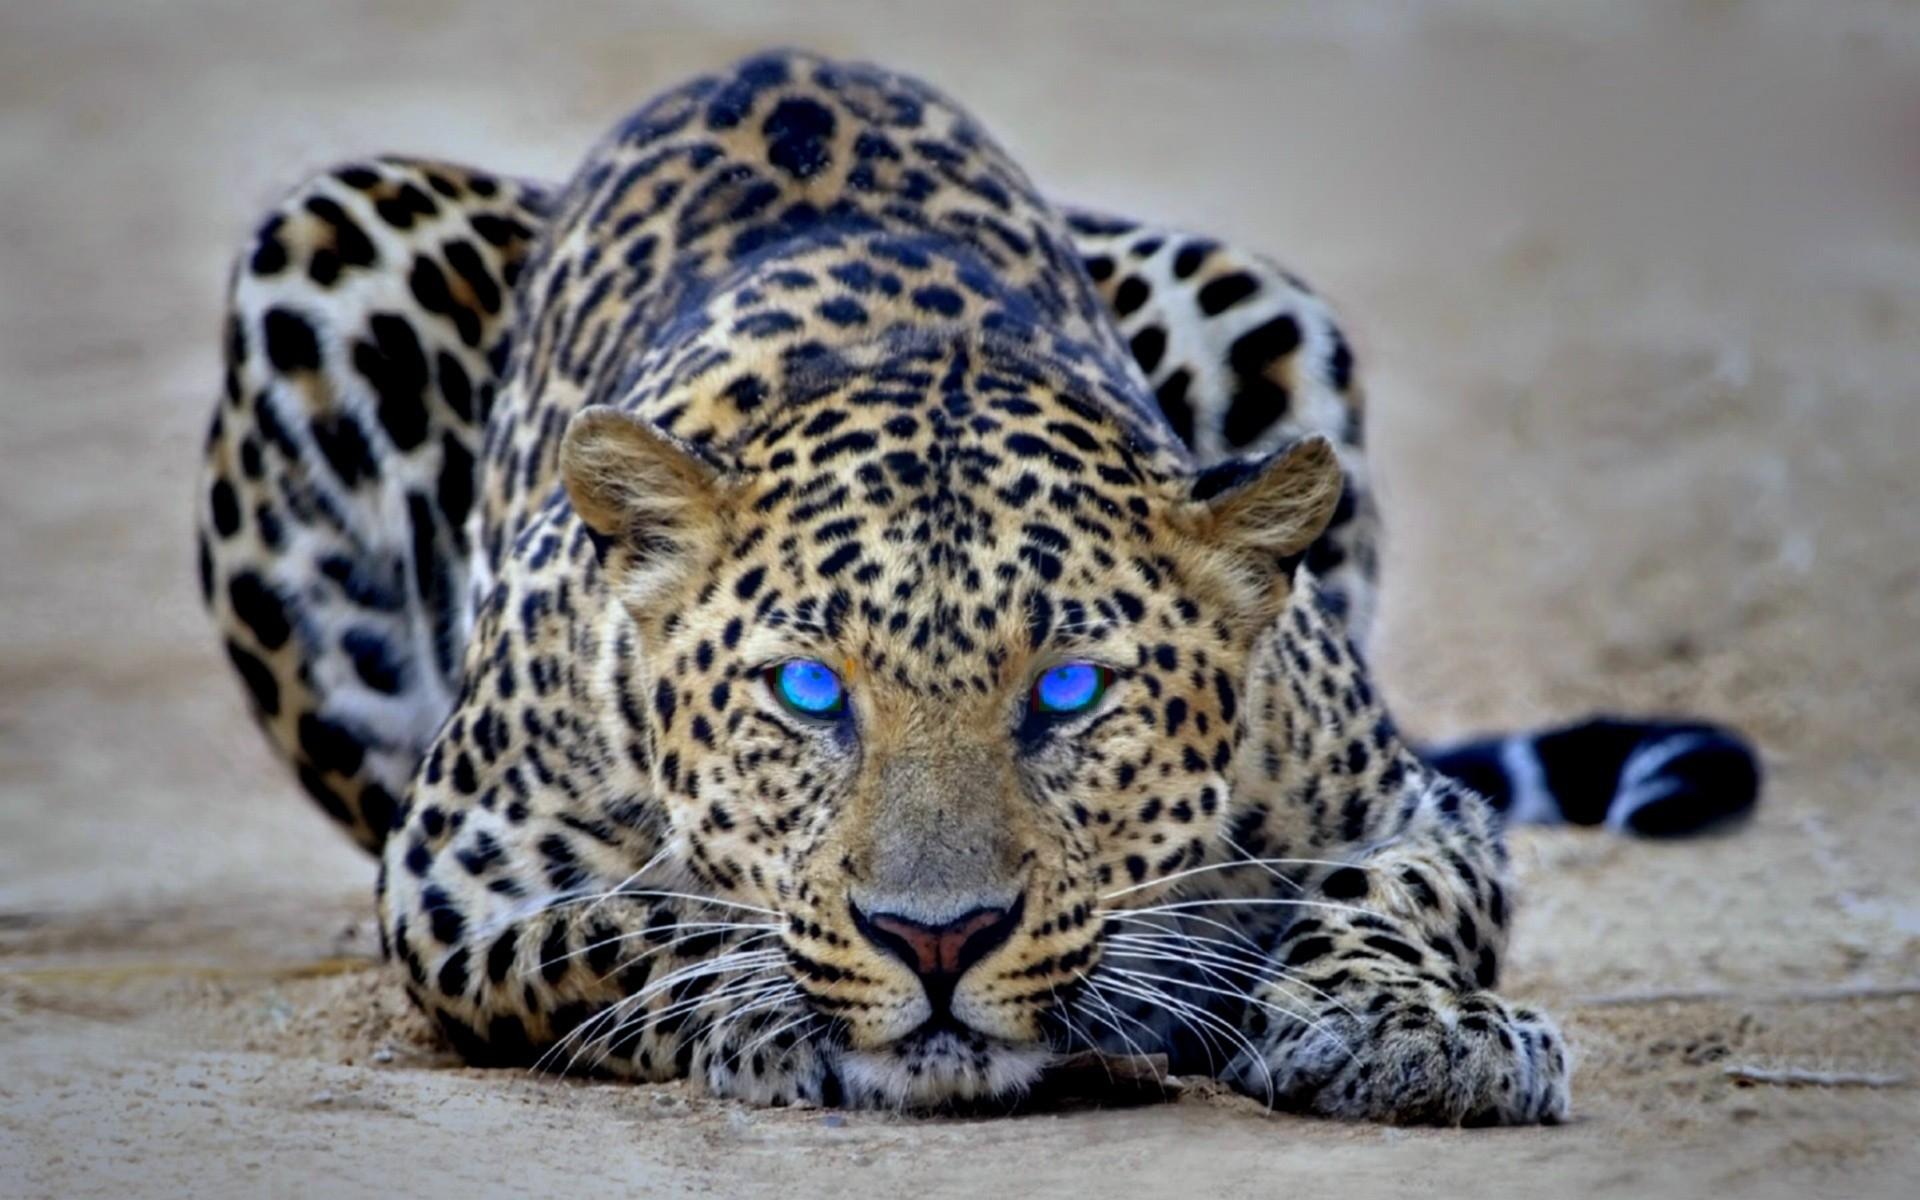 Cheetah animal hd wallpaper